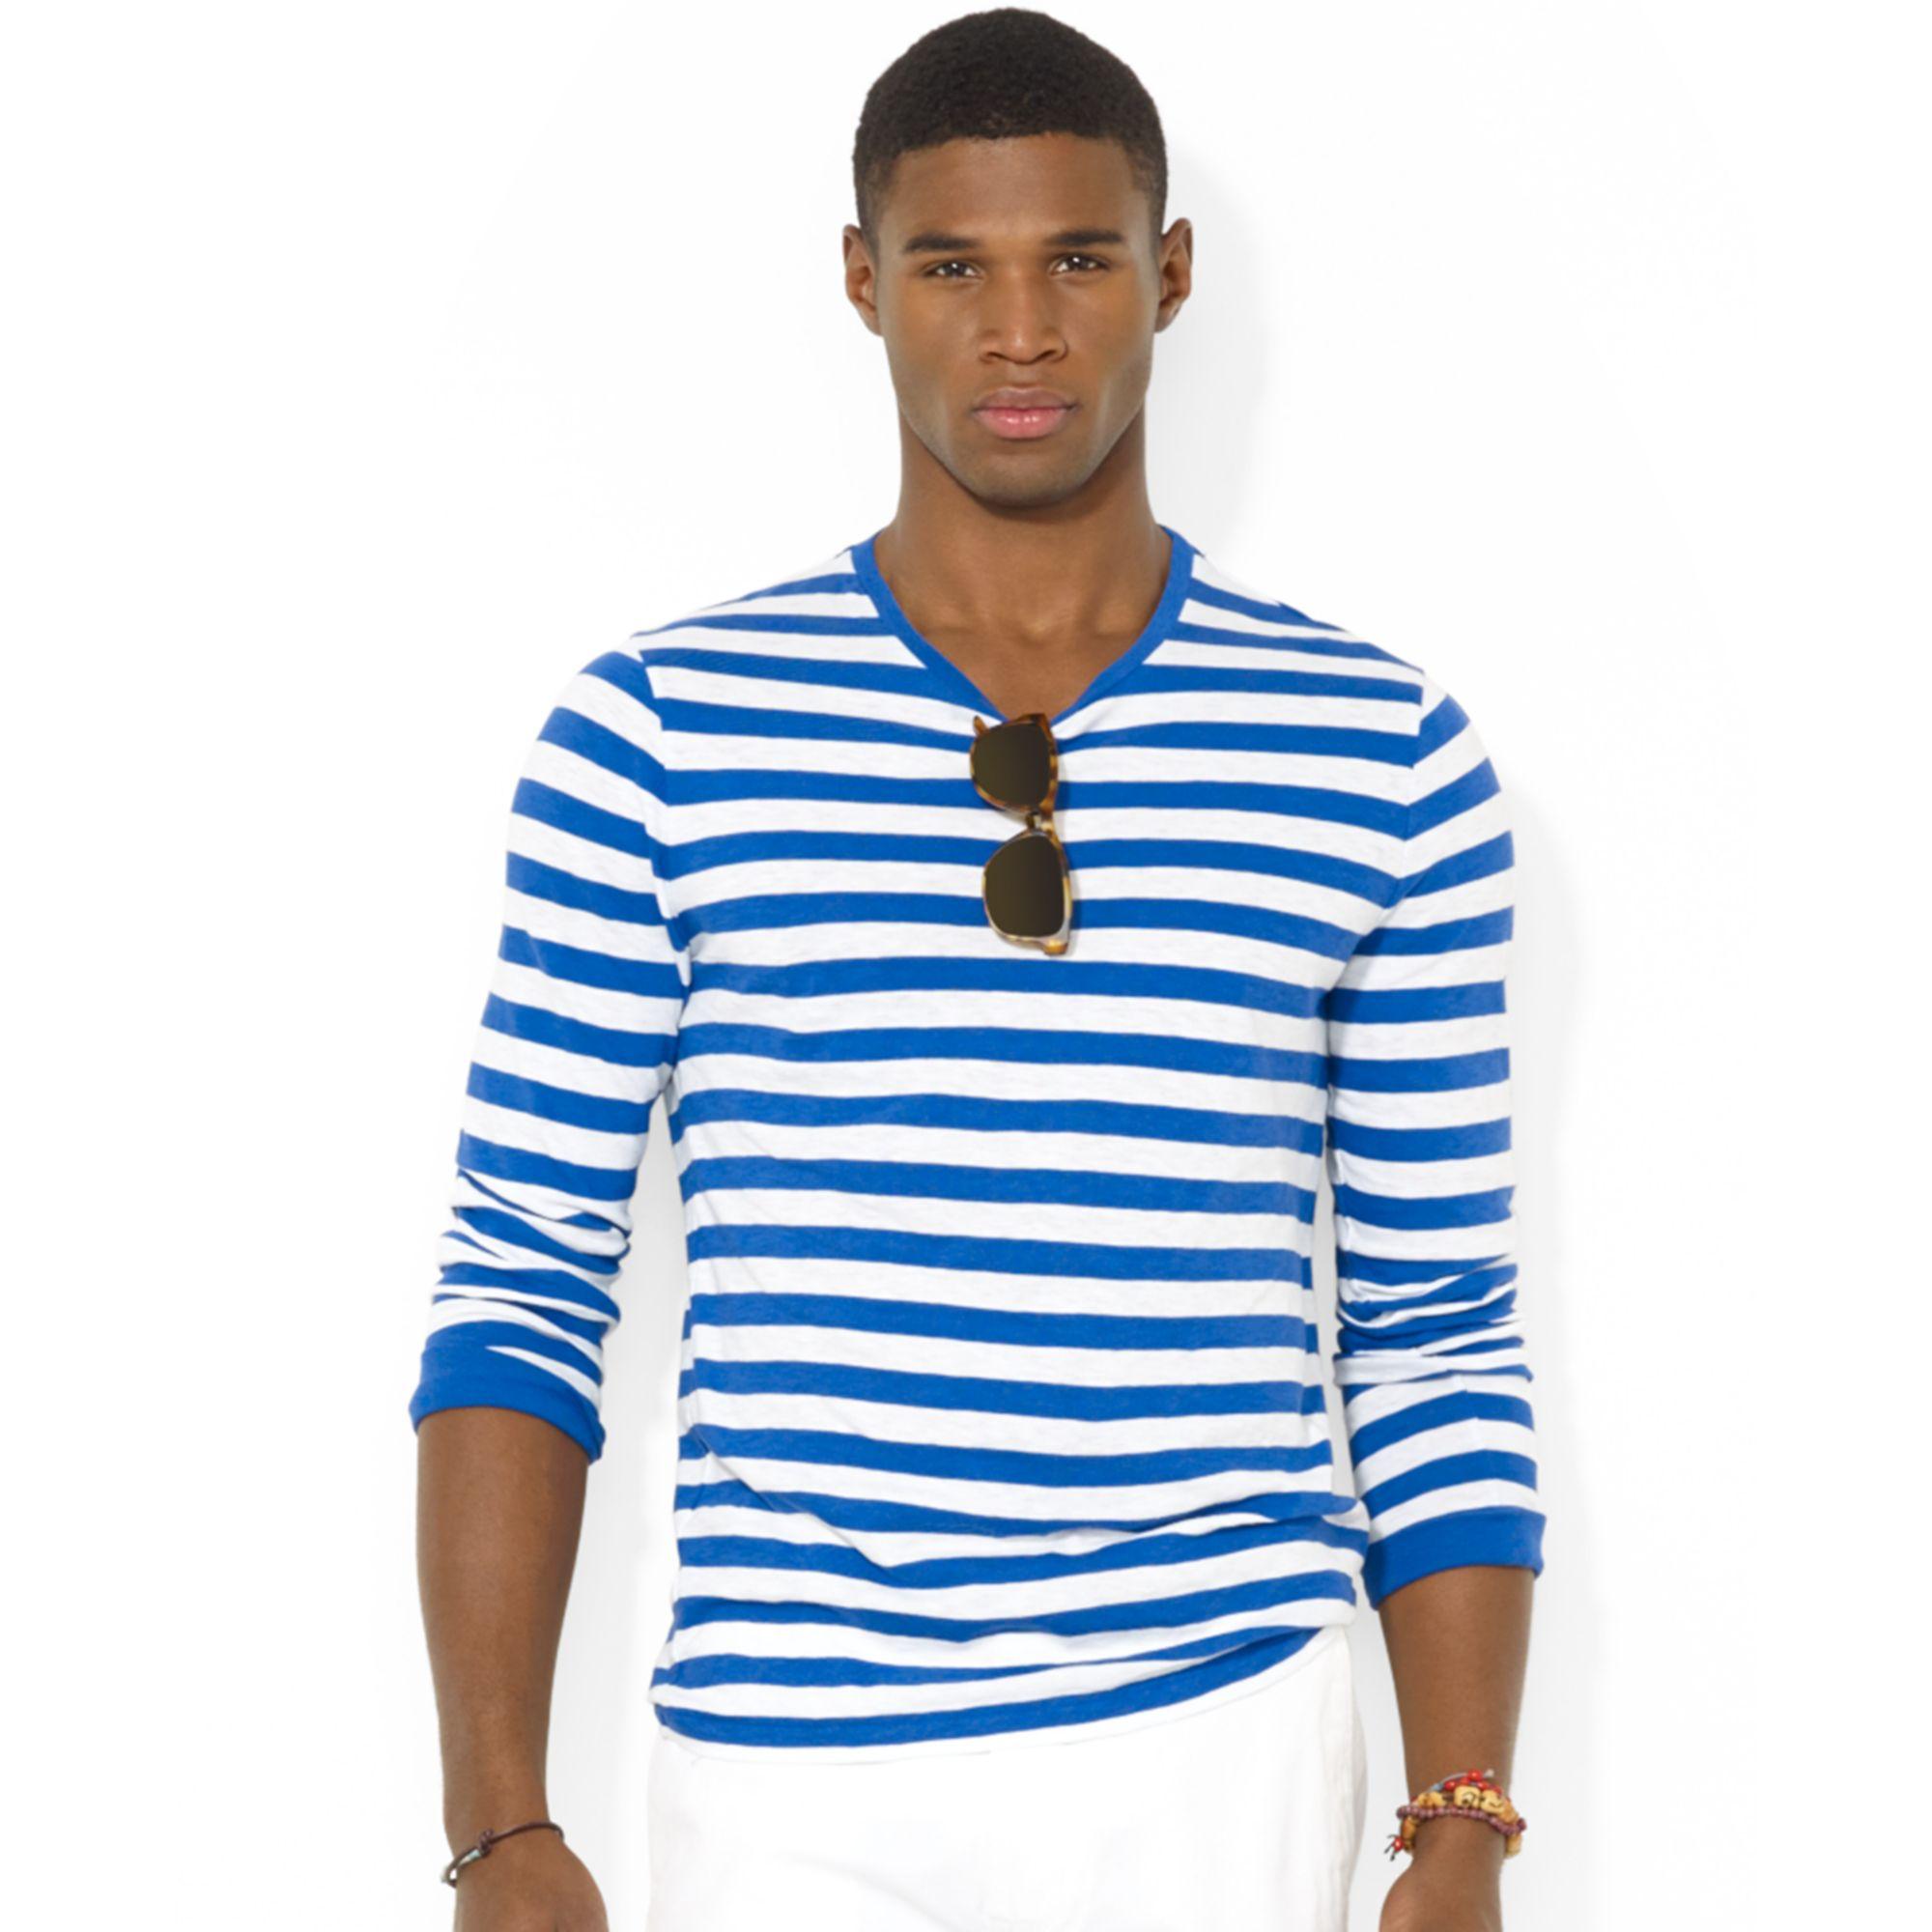 Ralph lauren polo longsleeved striped jersey tshirt in for Ralph lauren polo jersey shirt